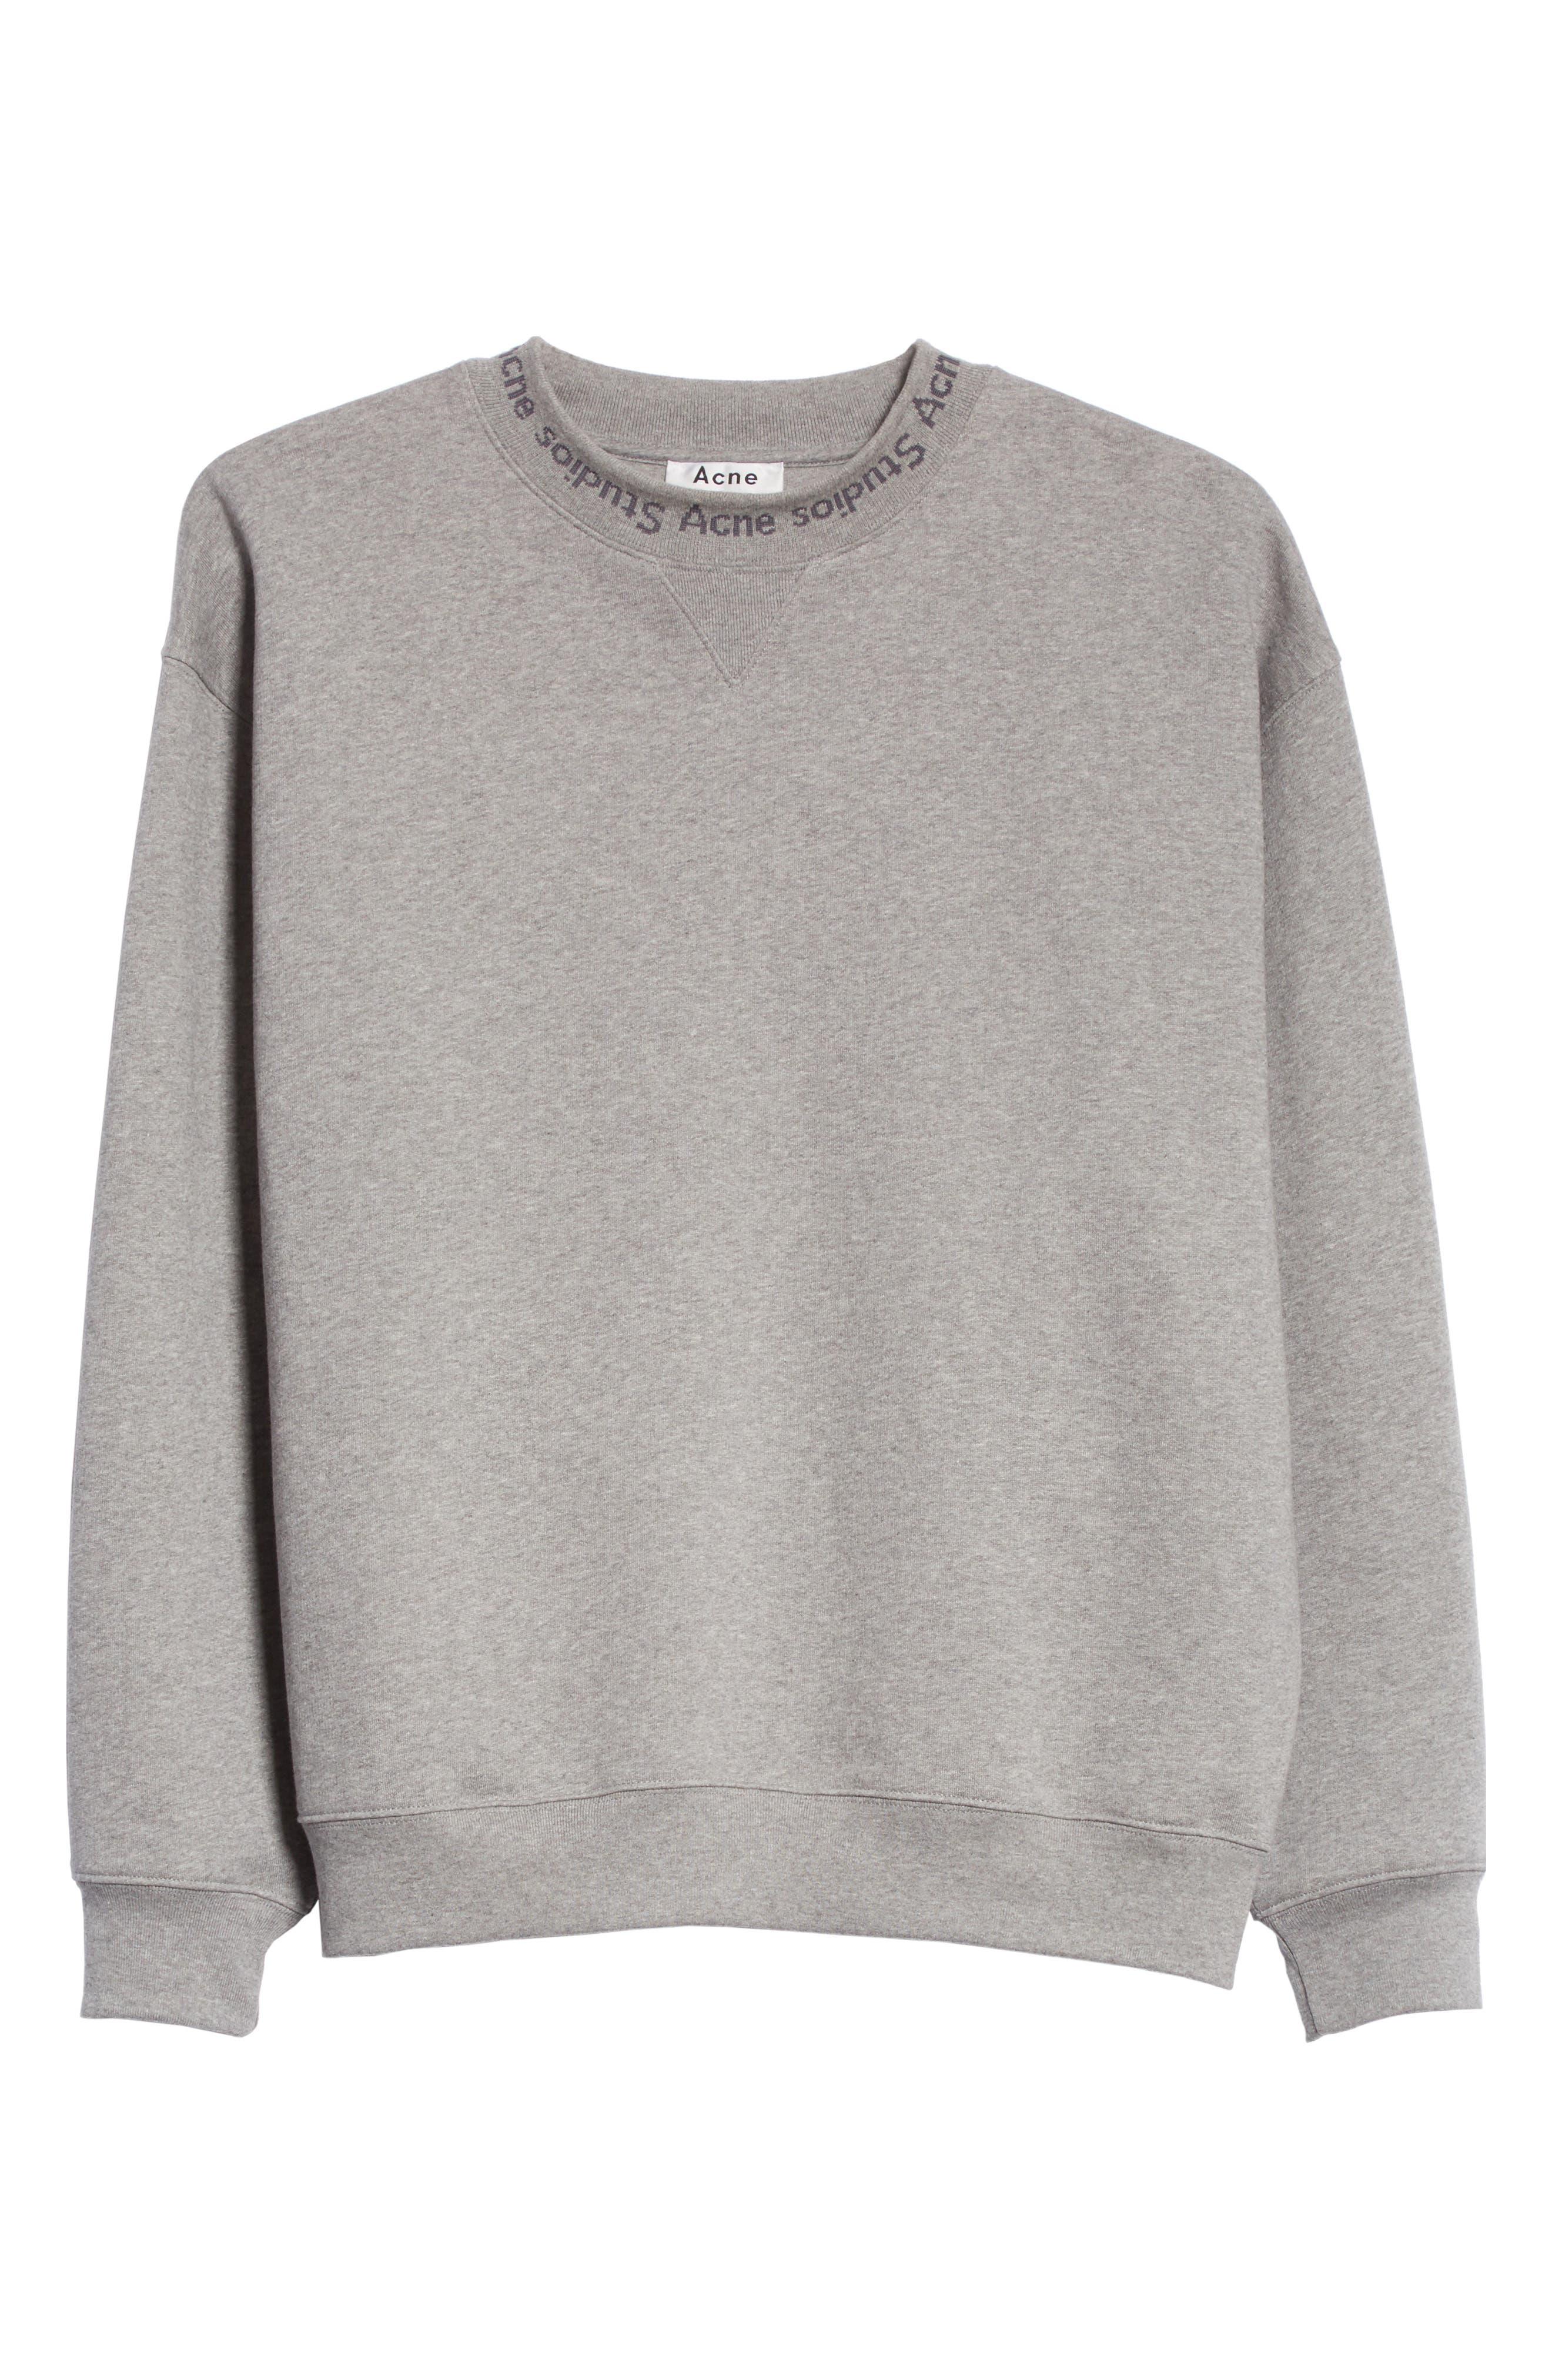 Flogo Oversize Cotton Sweatshirt,                             Alternate thumbnail 6, color,                             LIGHT GREY MELANGE